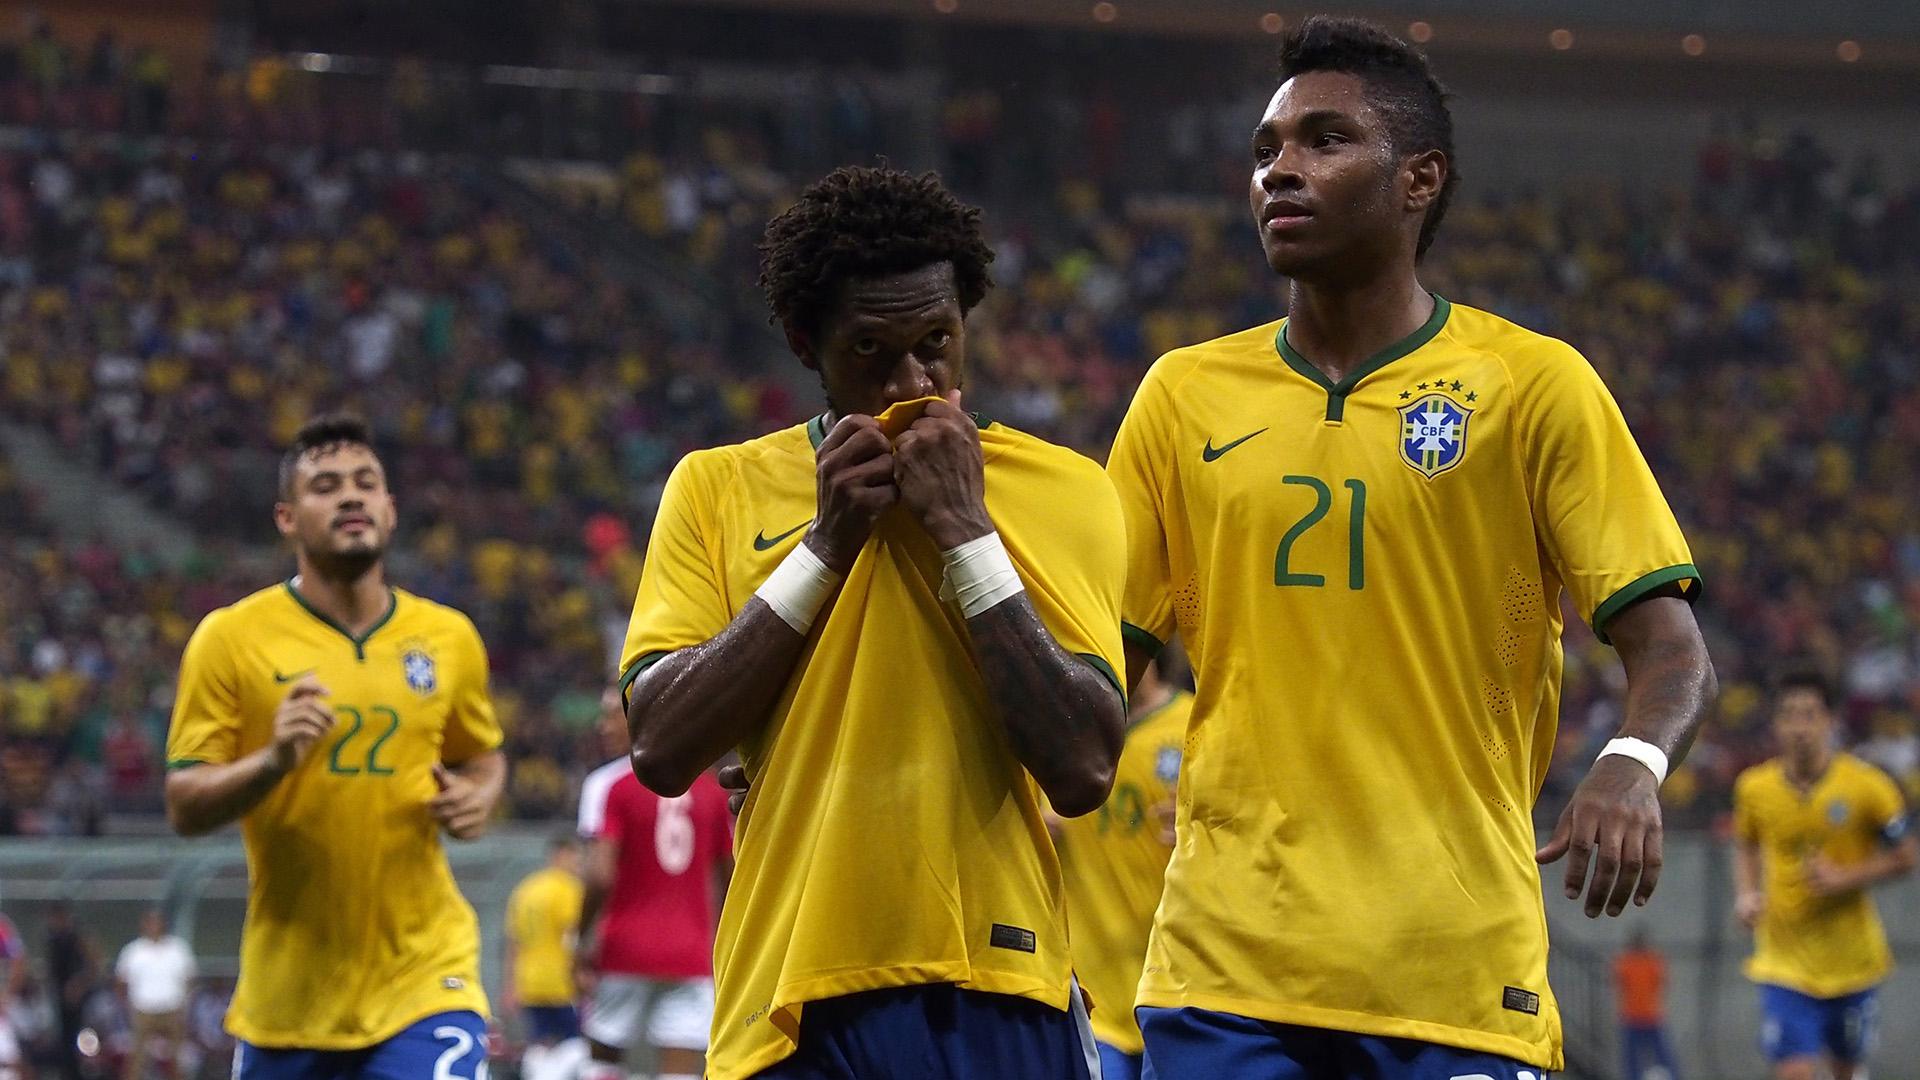 Fred Vitinho Brazil U23 Dominican Republic Friendly 09102015